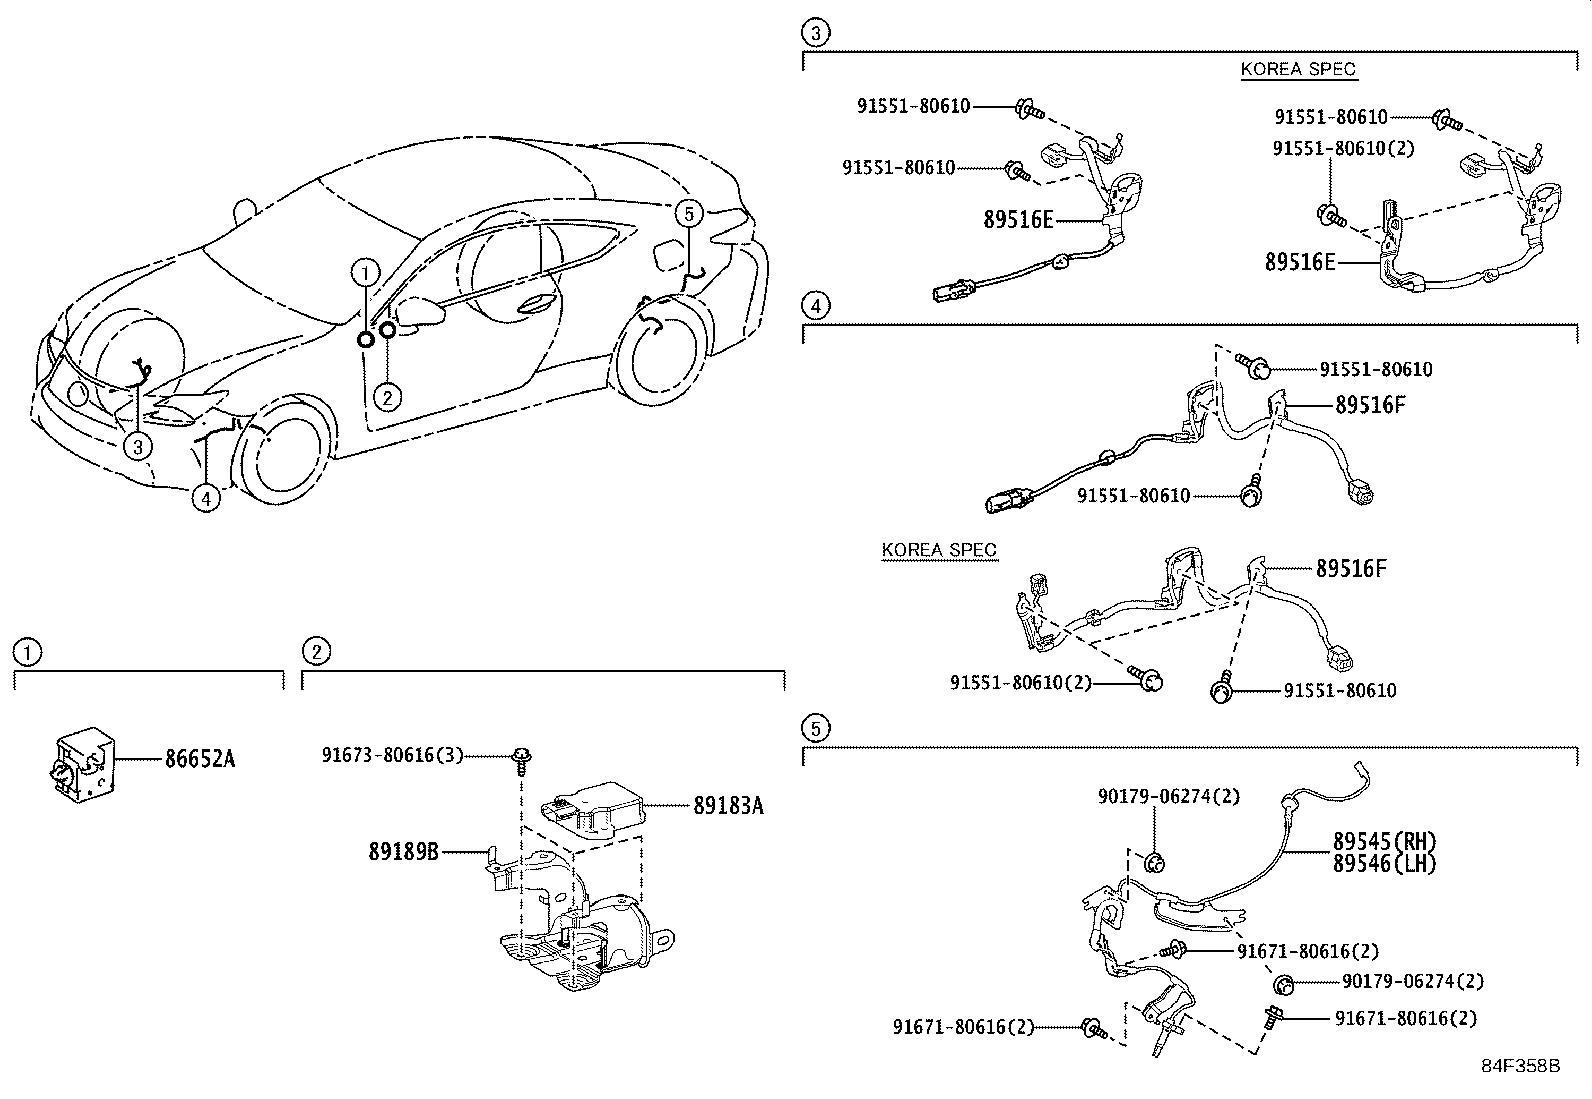 2008 Lexus Abs wheel speed sensor wiring harness (right